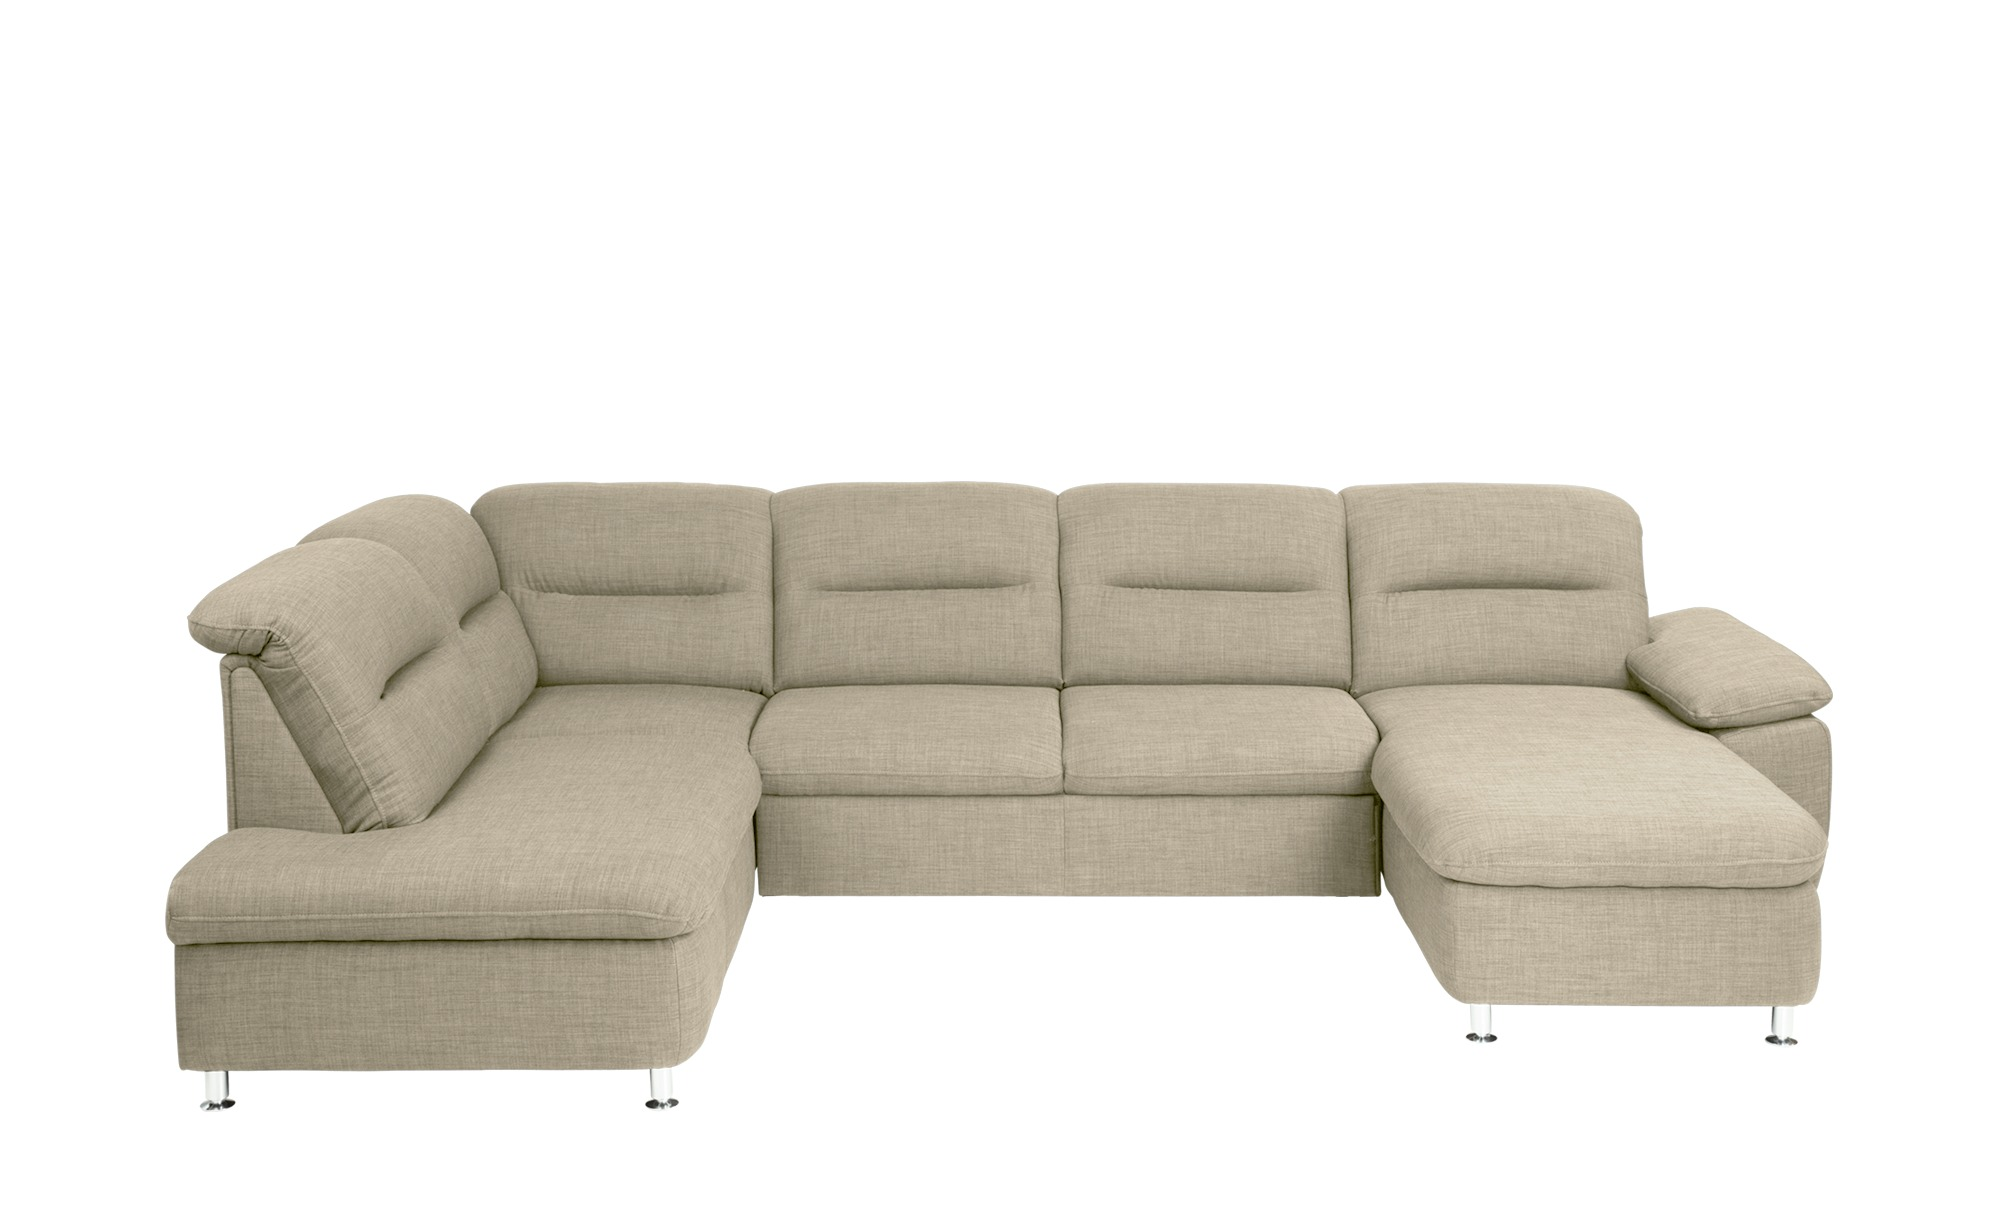 meinsofa beige wohnlandschaft senta breite h he creme. Black Bedroom Furniture Sets. Home Design Ideas